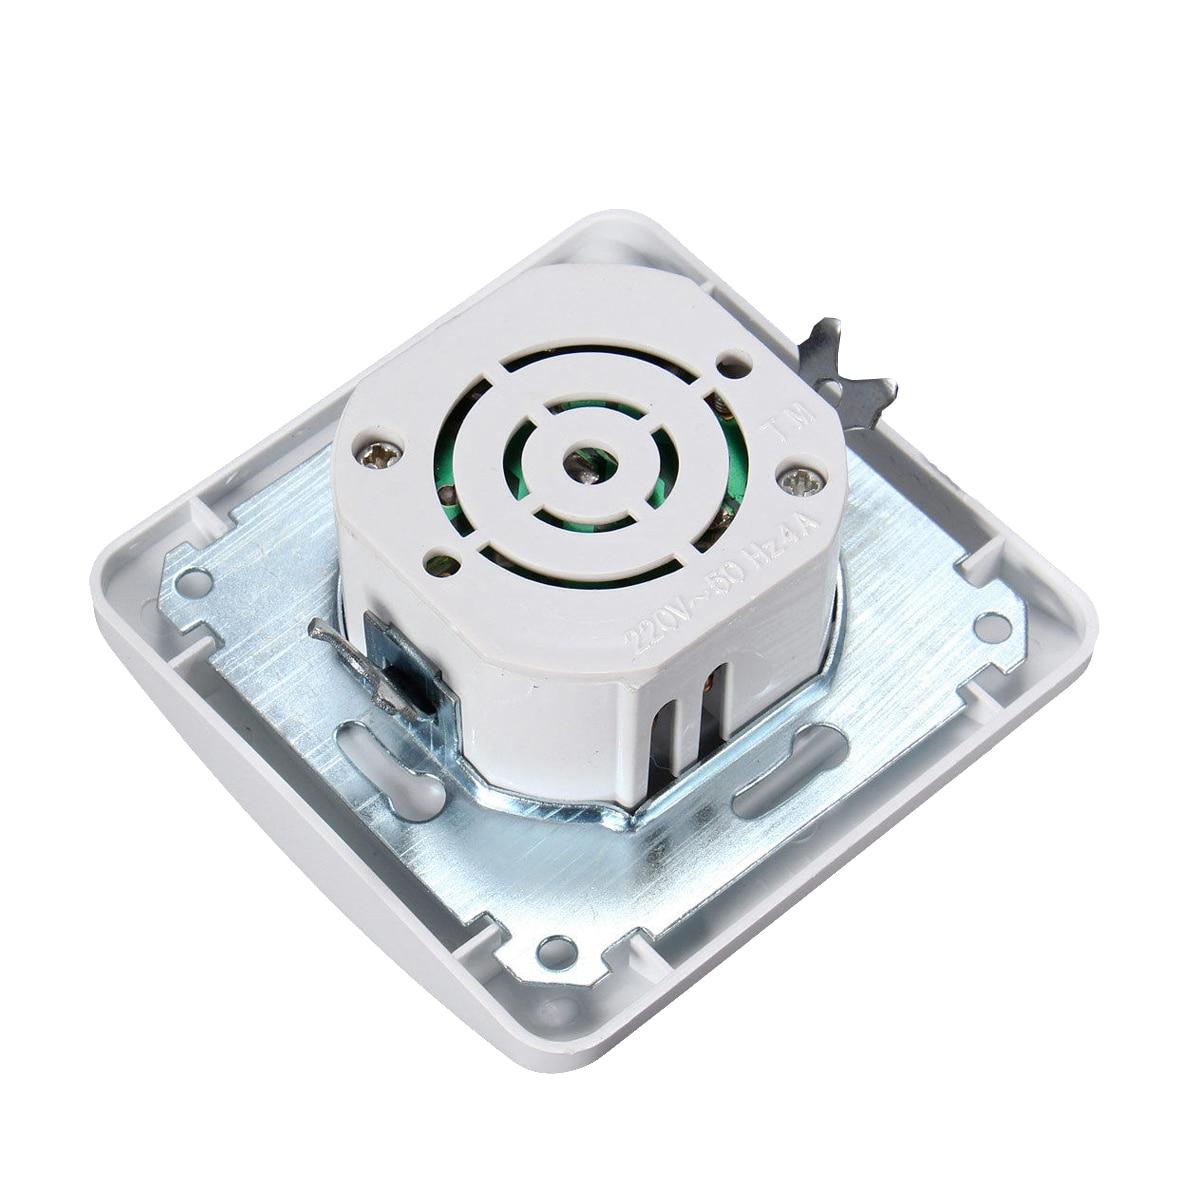 Dimmers lâmpada de luz branca Marca : Refurbishhouse